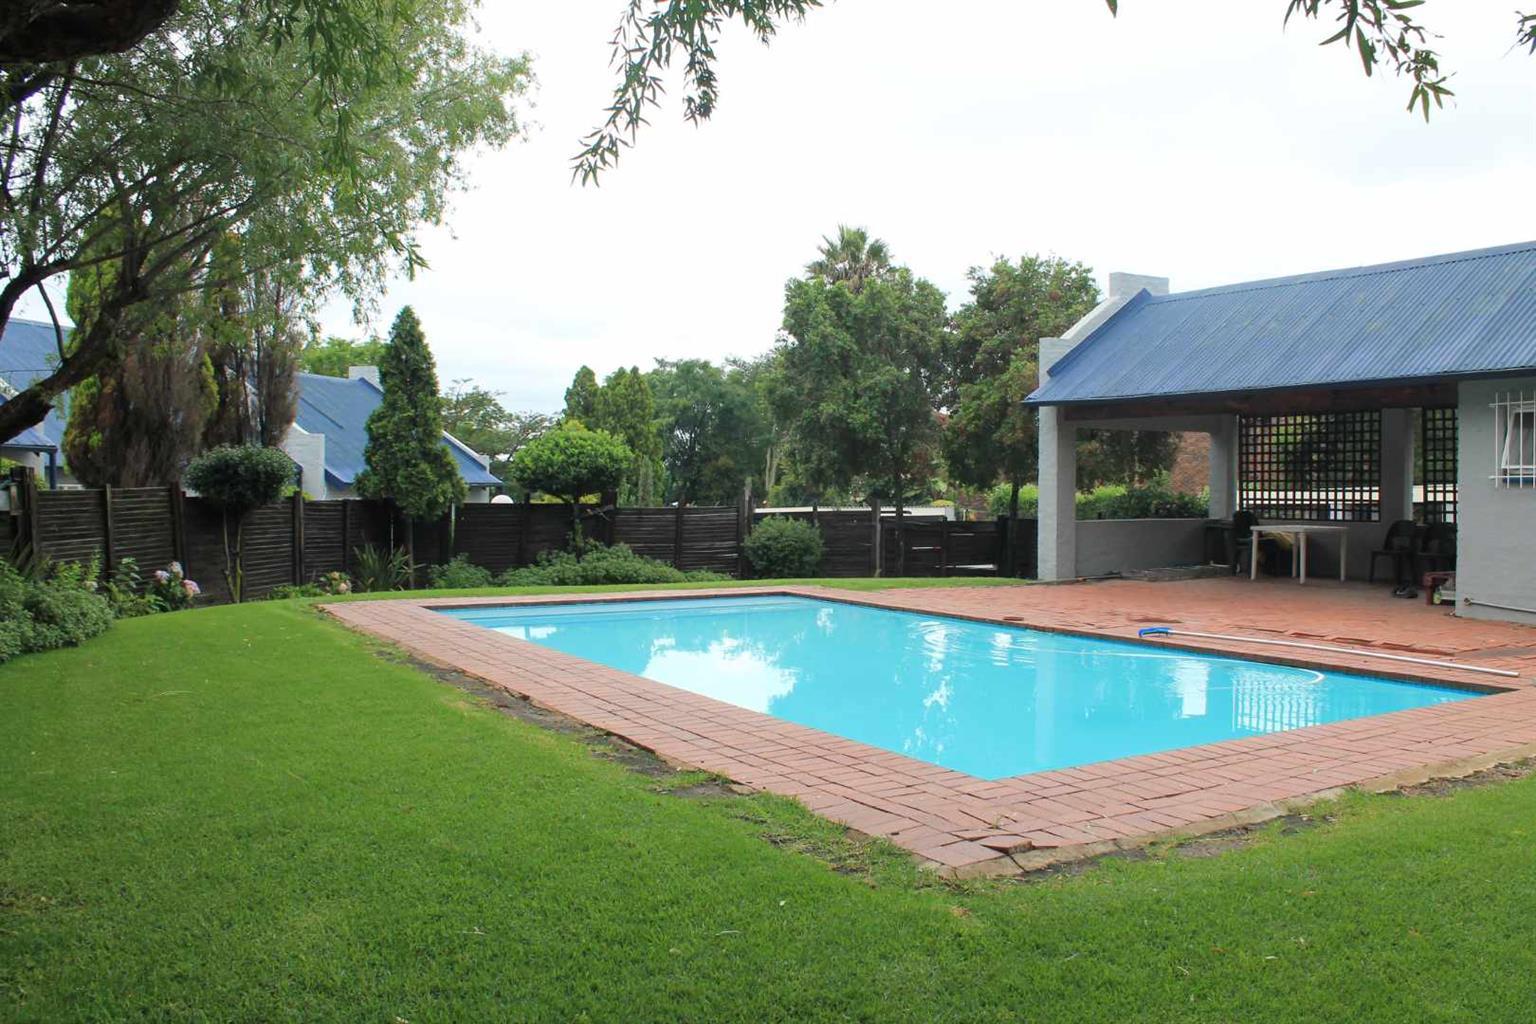 Townhouse Rental Monthly in Kelvin